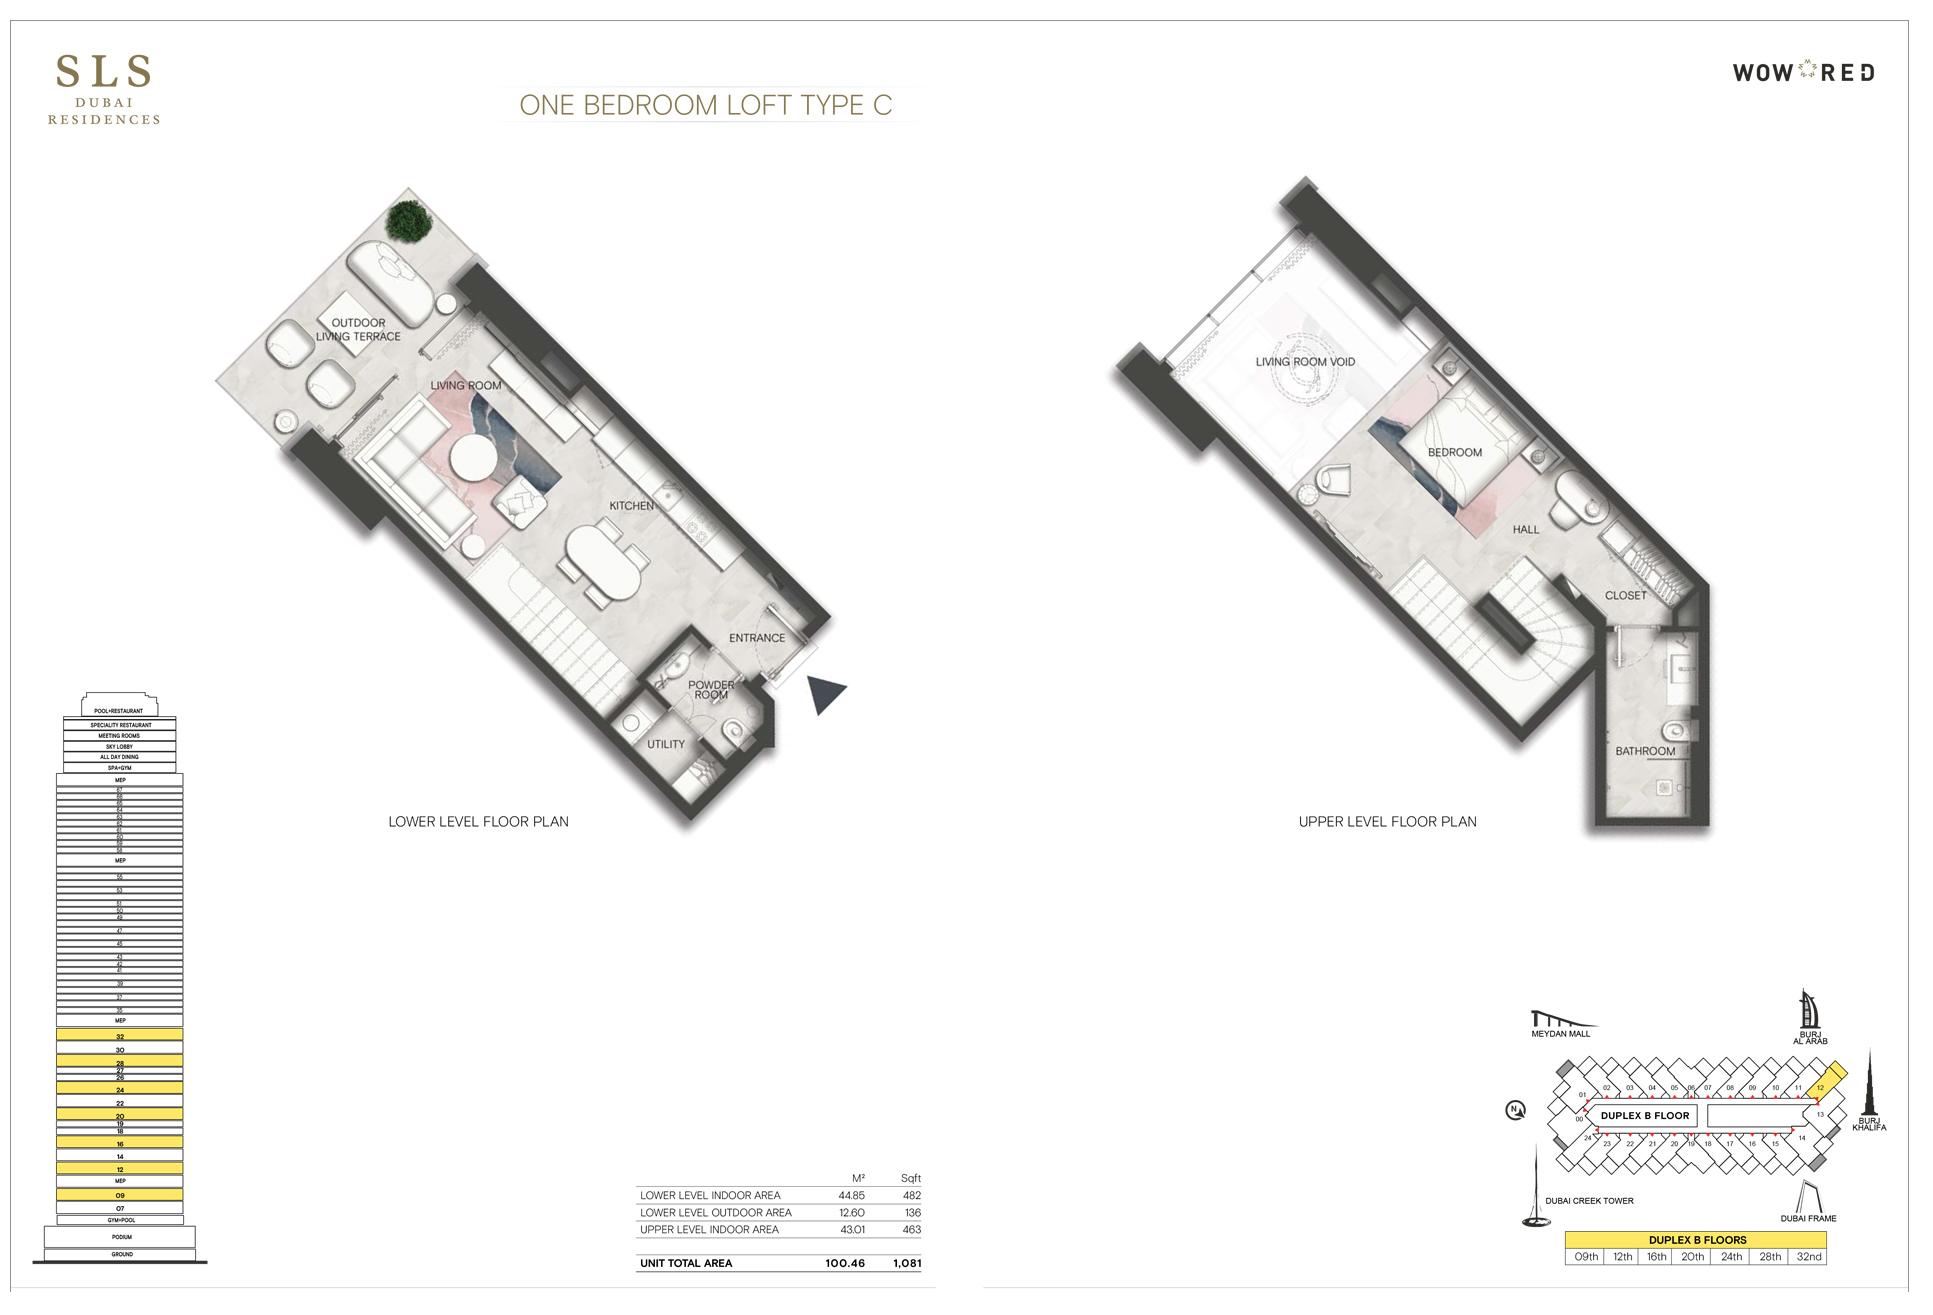 1 Bedroom Loft Type C Size 1081 Sq.ft